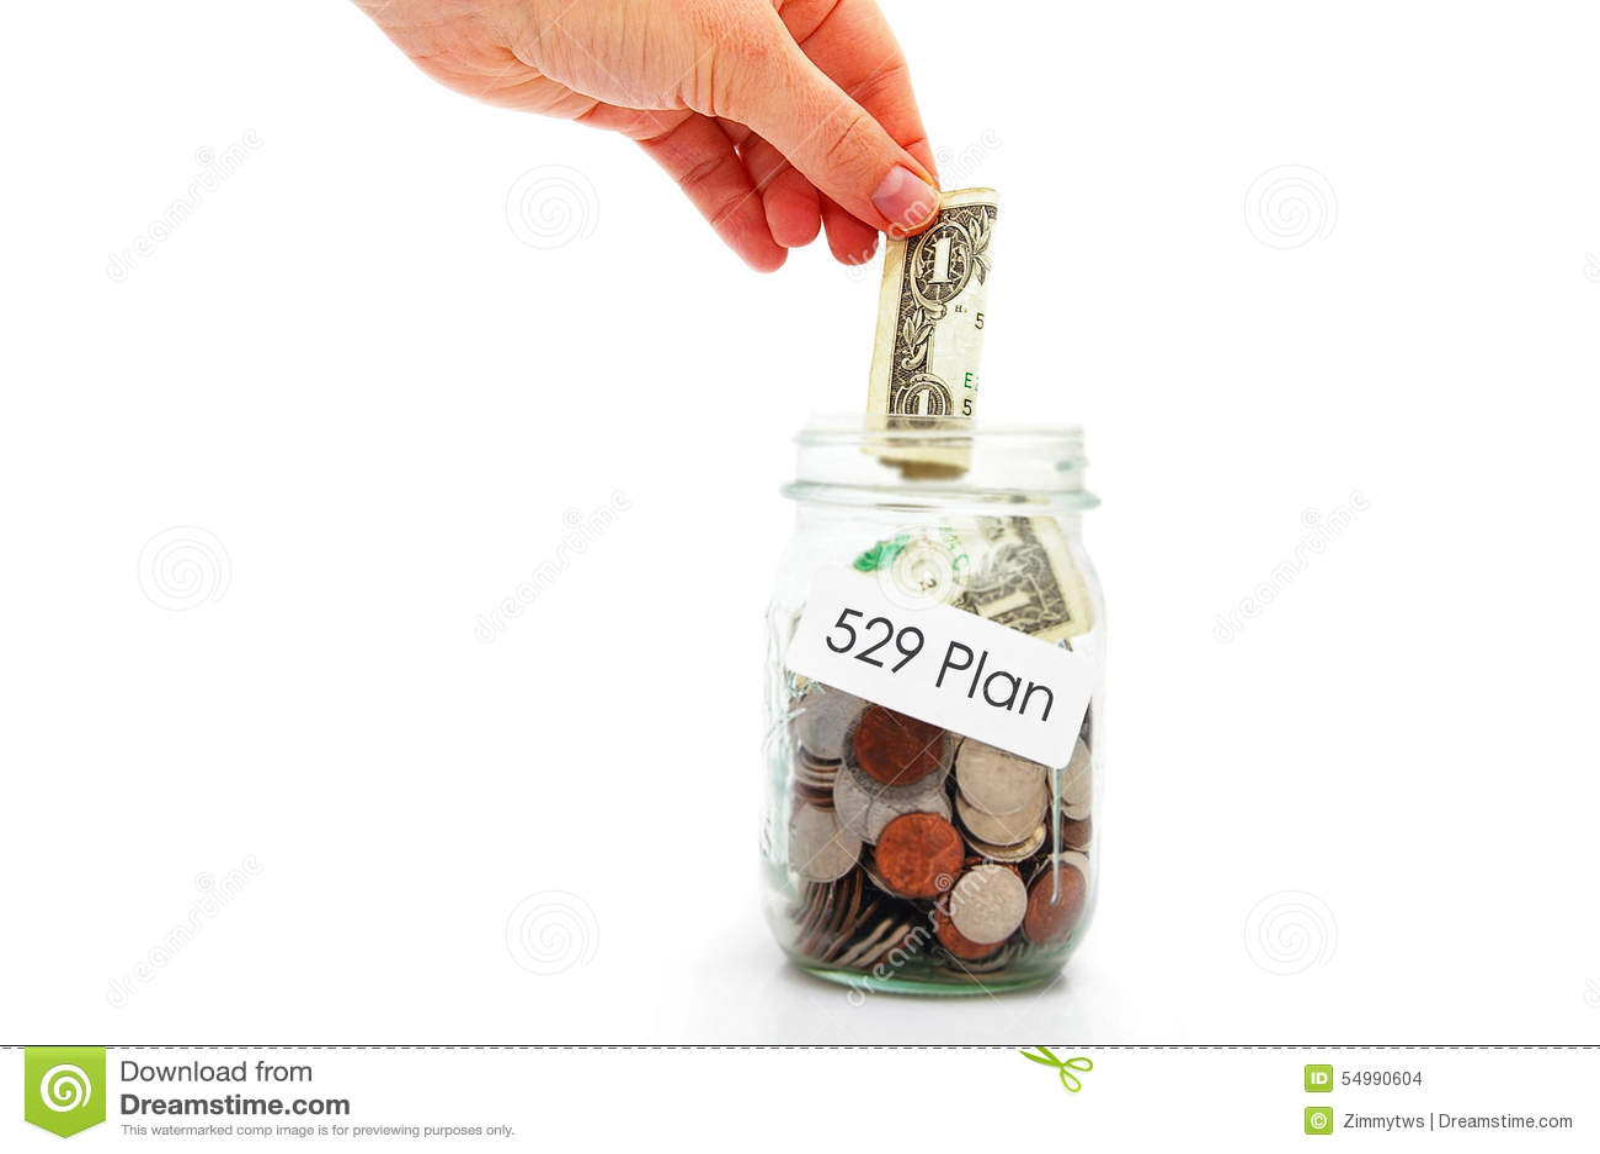 529 plan college savings stock photo image 54990604 for 5 29 plan